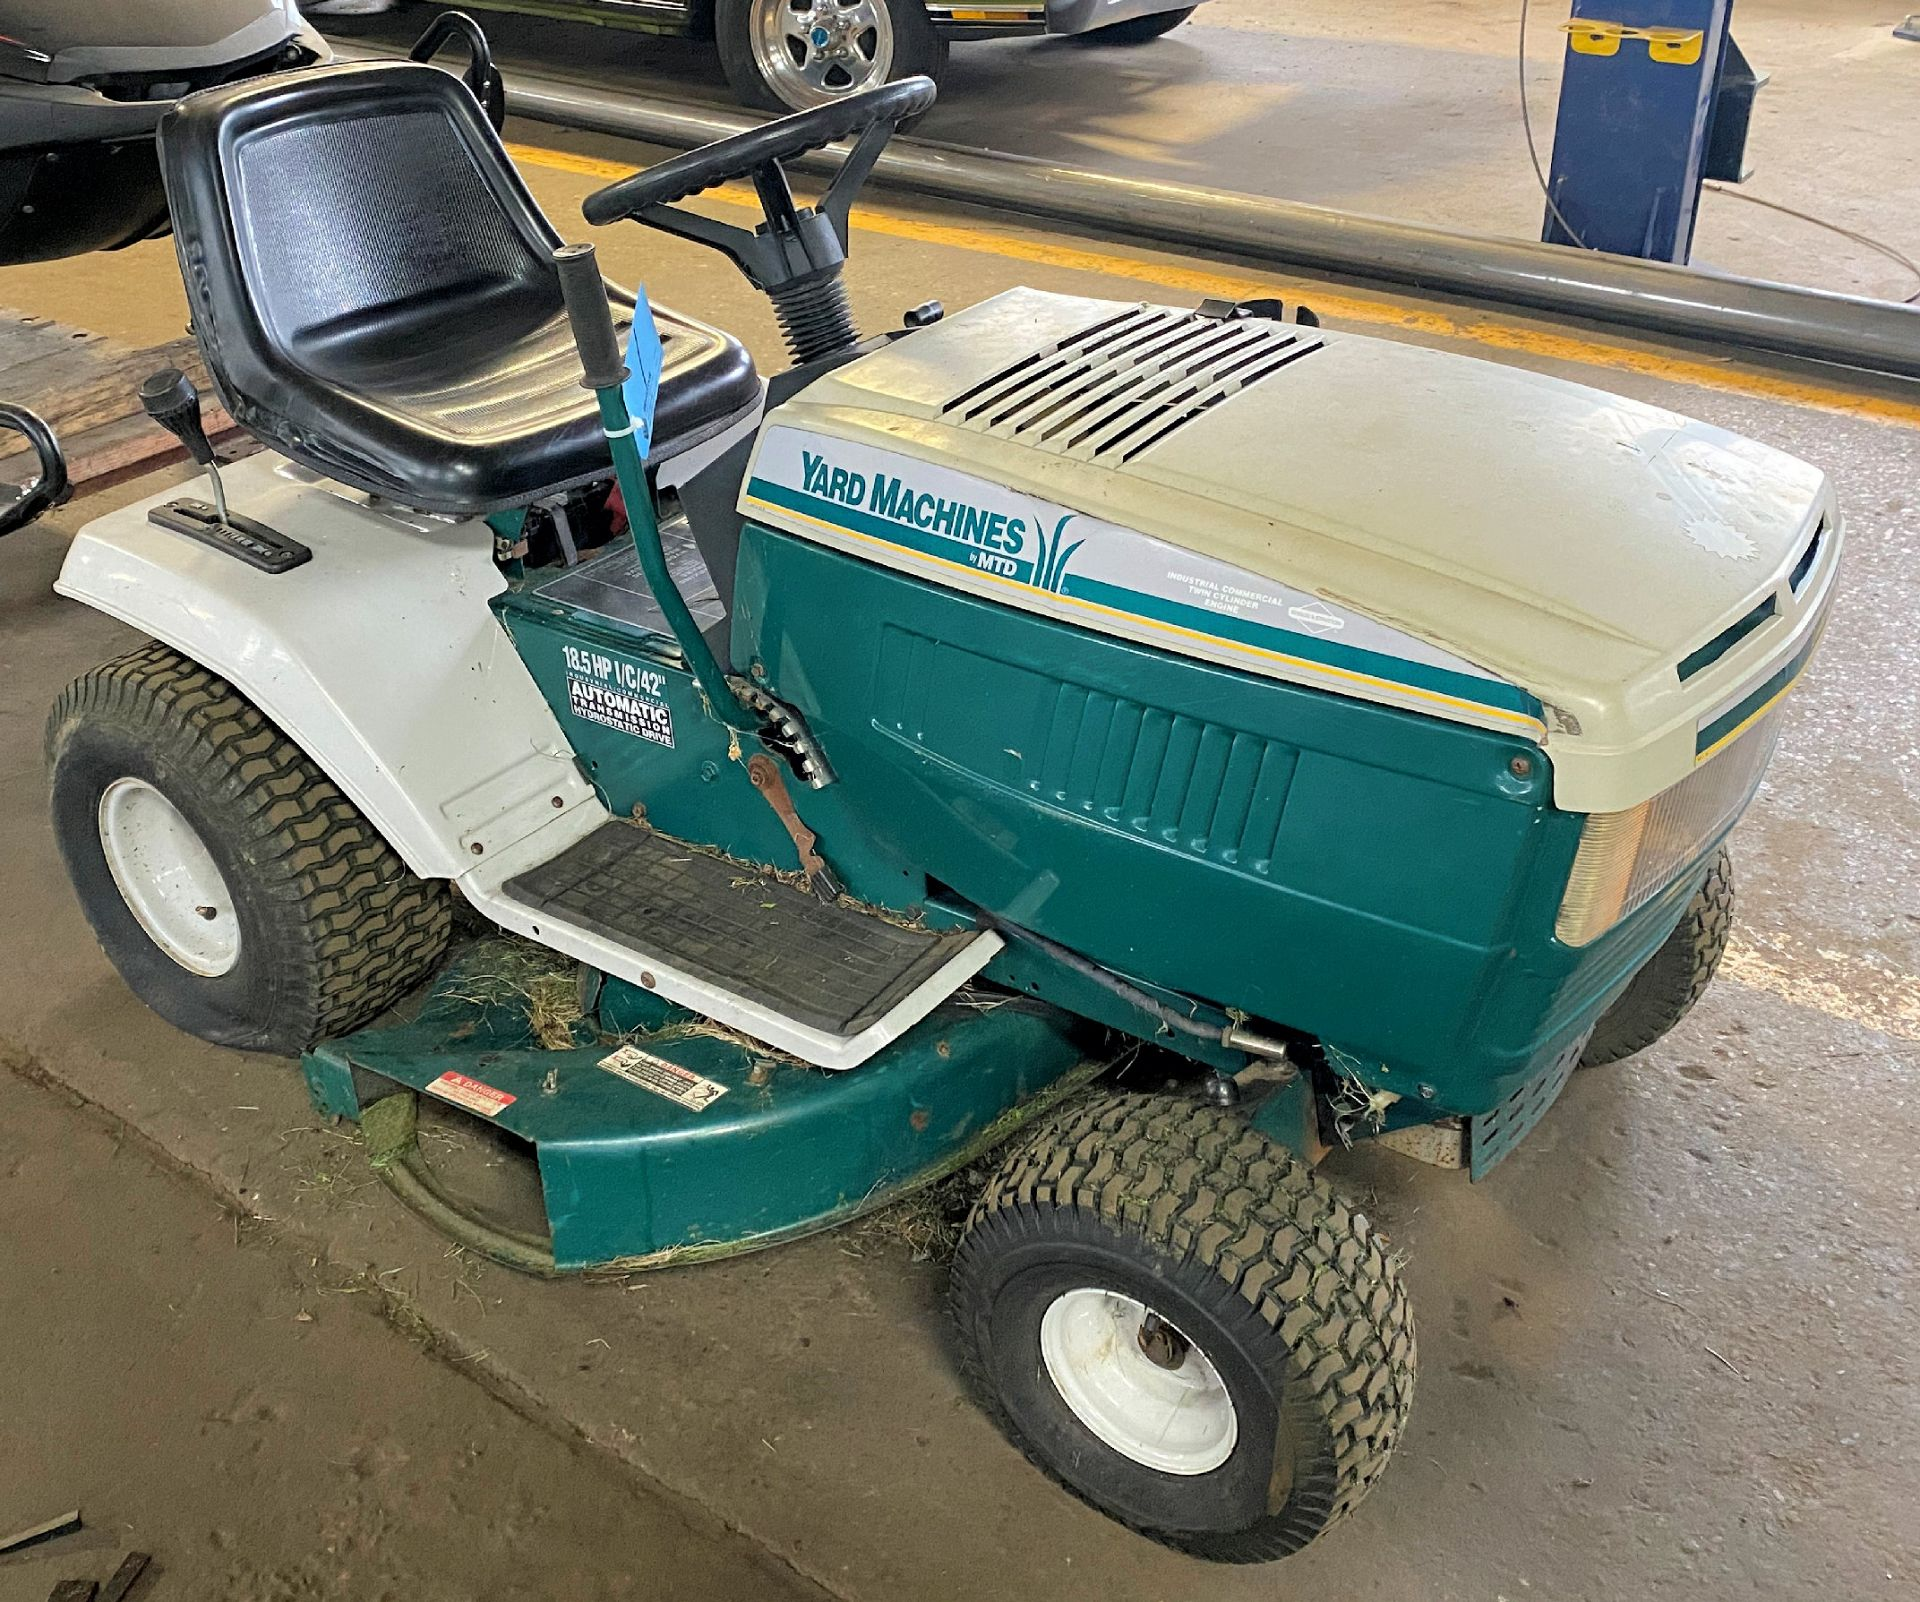 "MTD Yard Machine 18.5-HP x 42"" Cut, Gas Powered Riding Lawn Mower - Image 2 of 3"